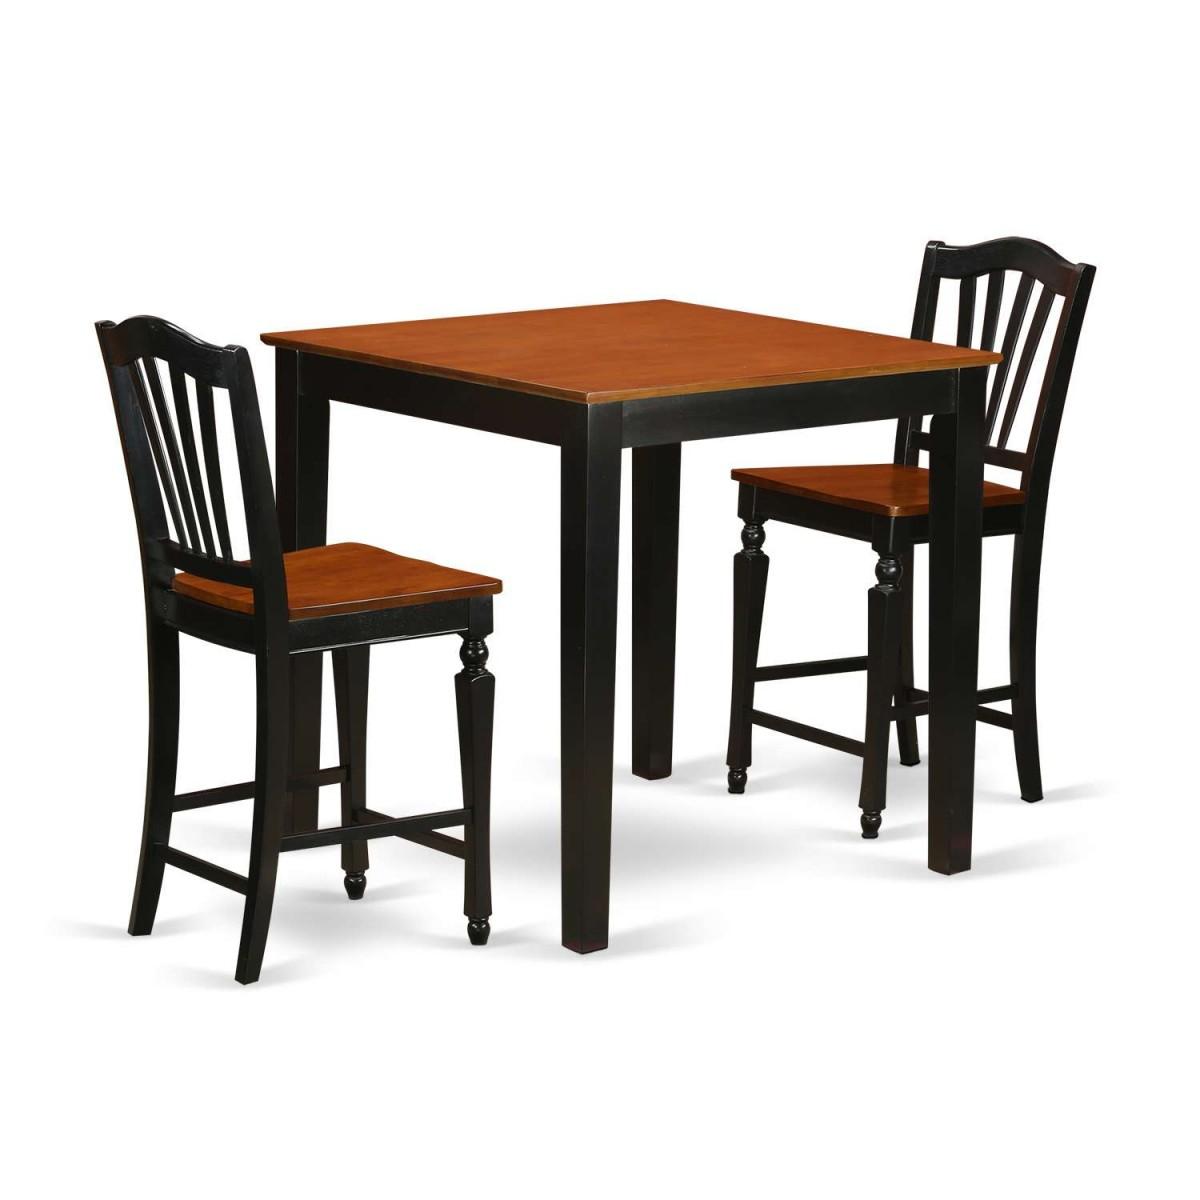 asian-pub-table-chairs-black-teen-crossdresser-petite